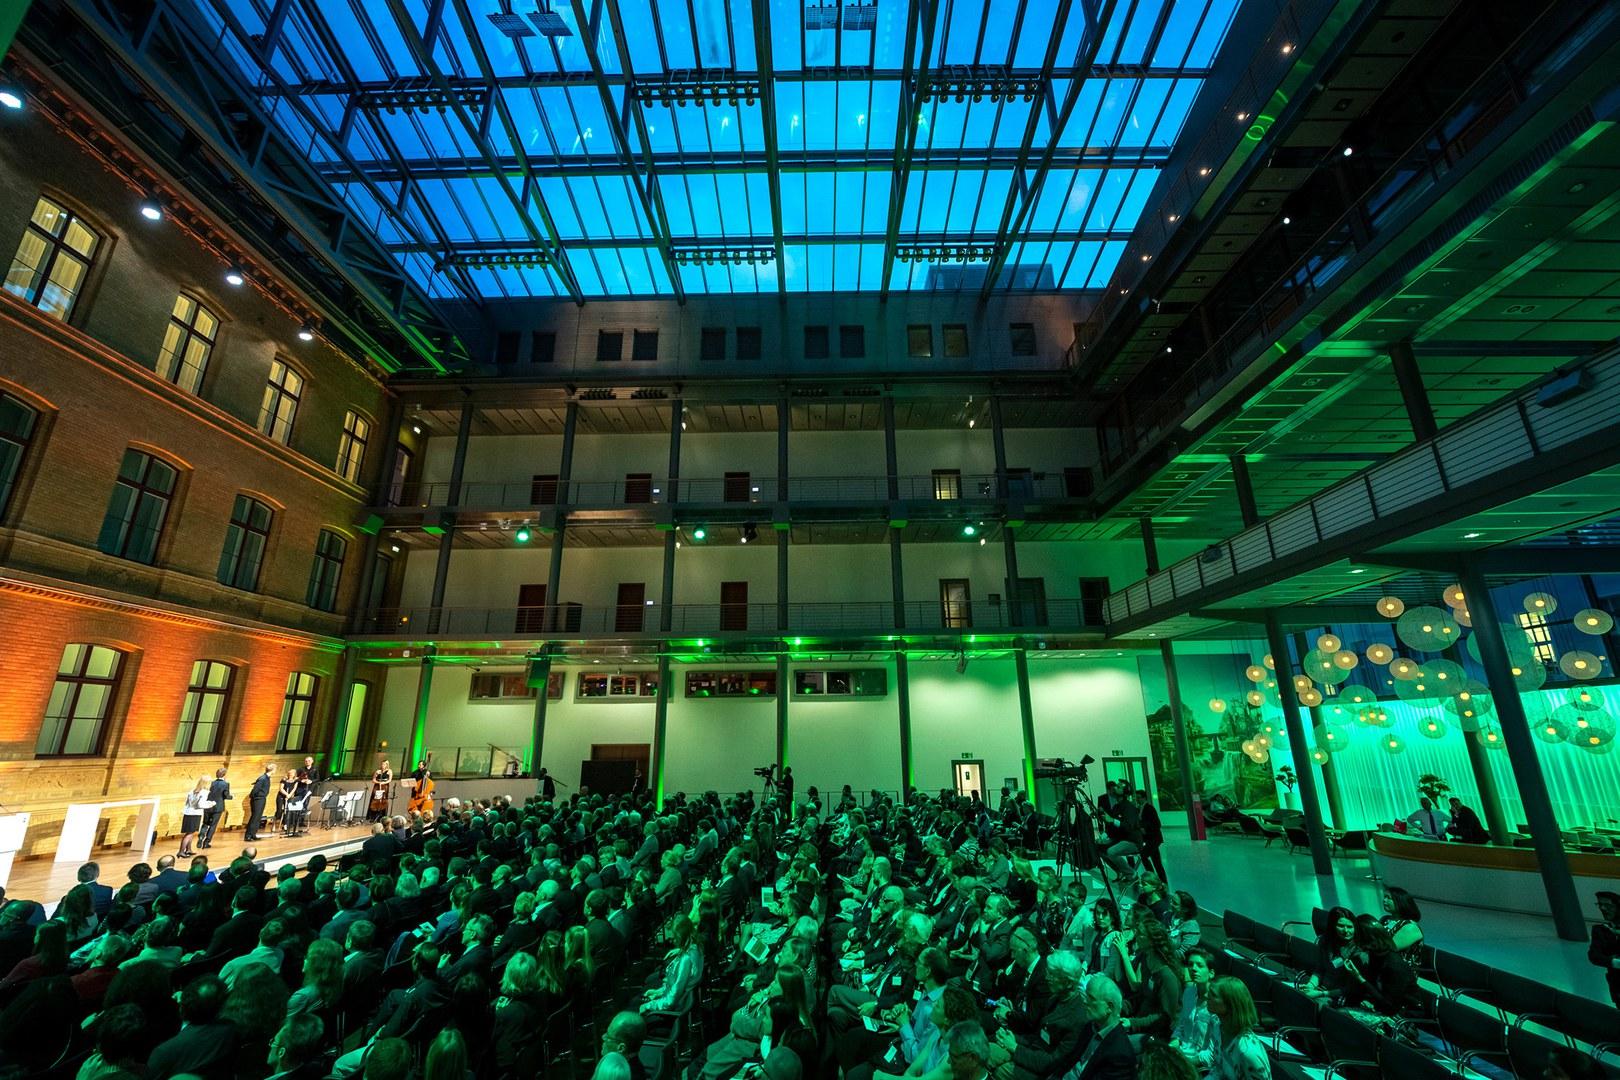 Festive event in Berlin: